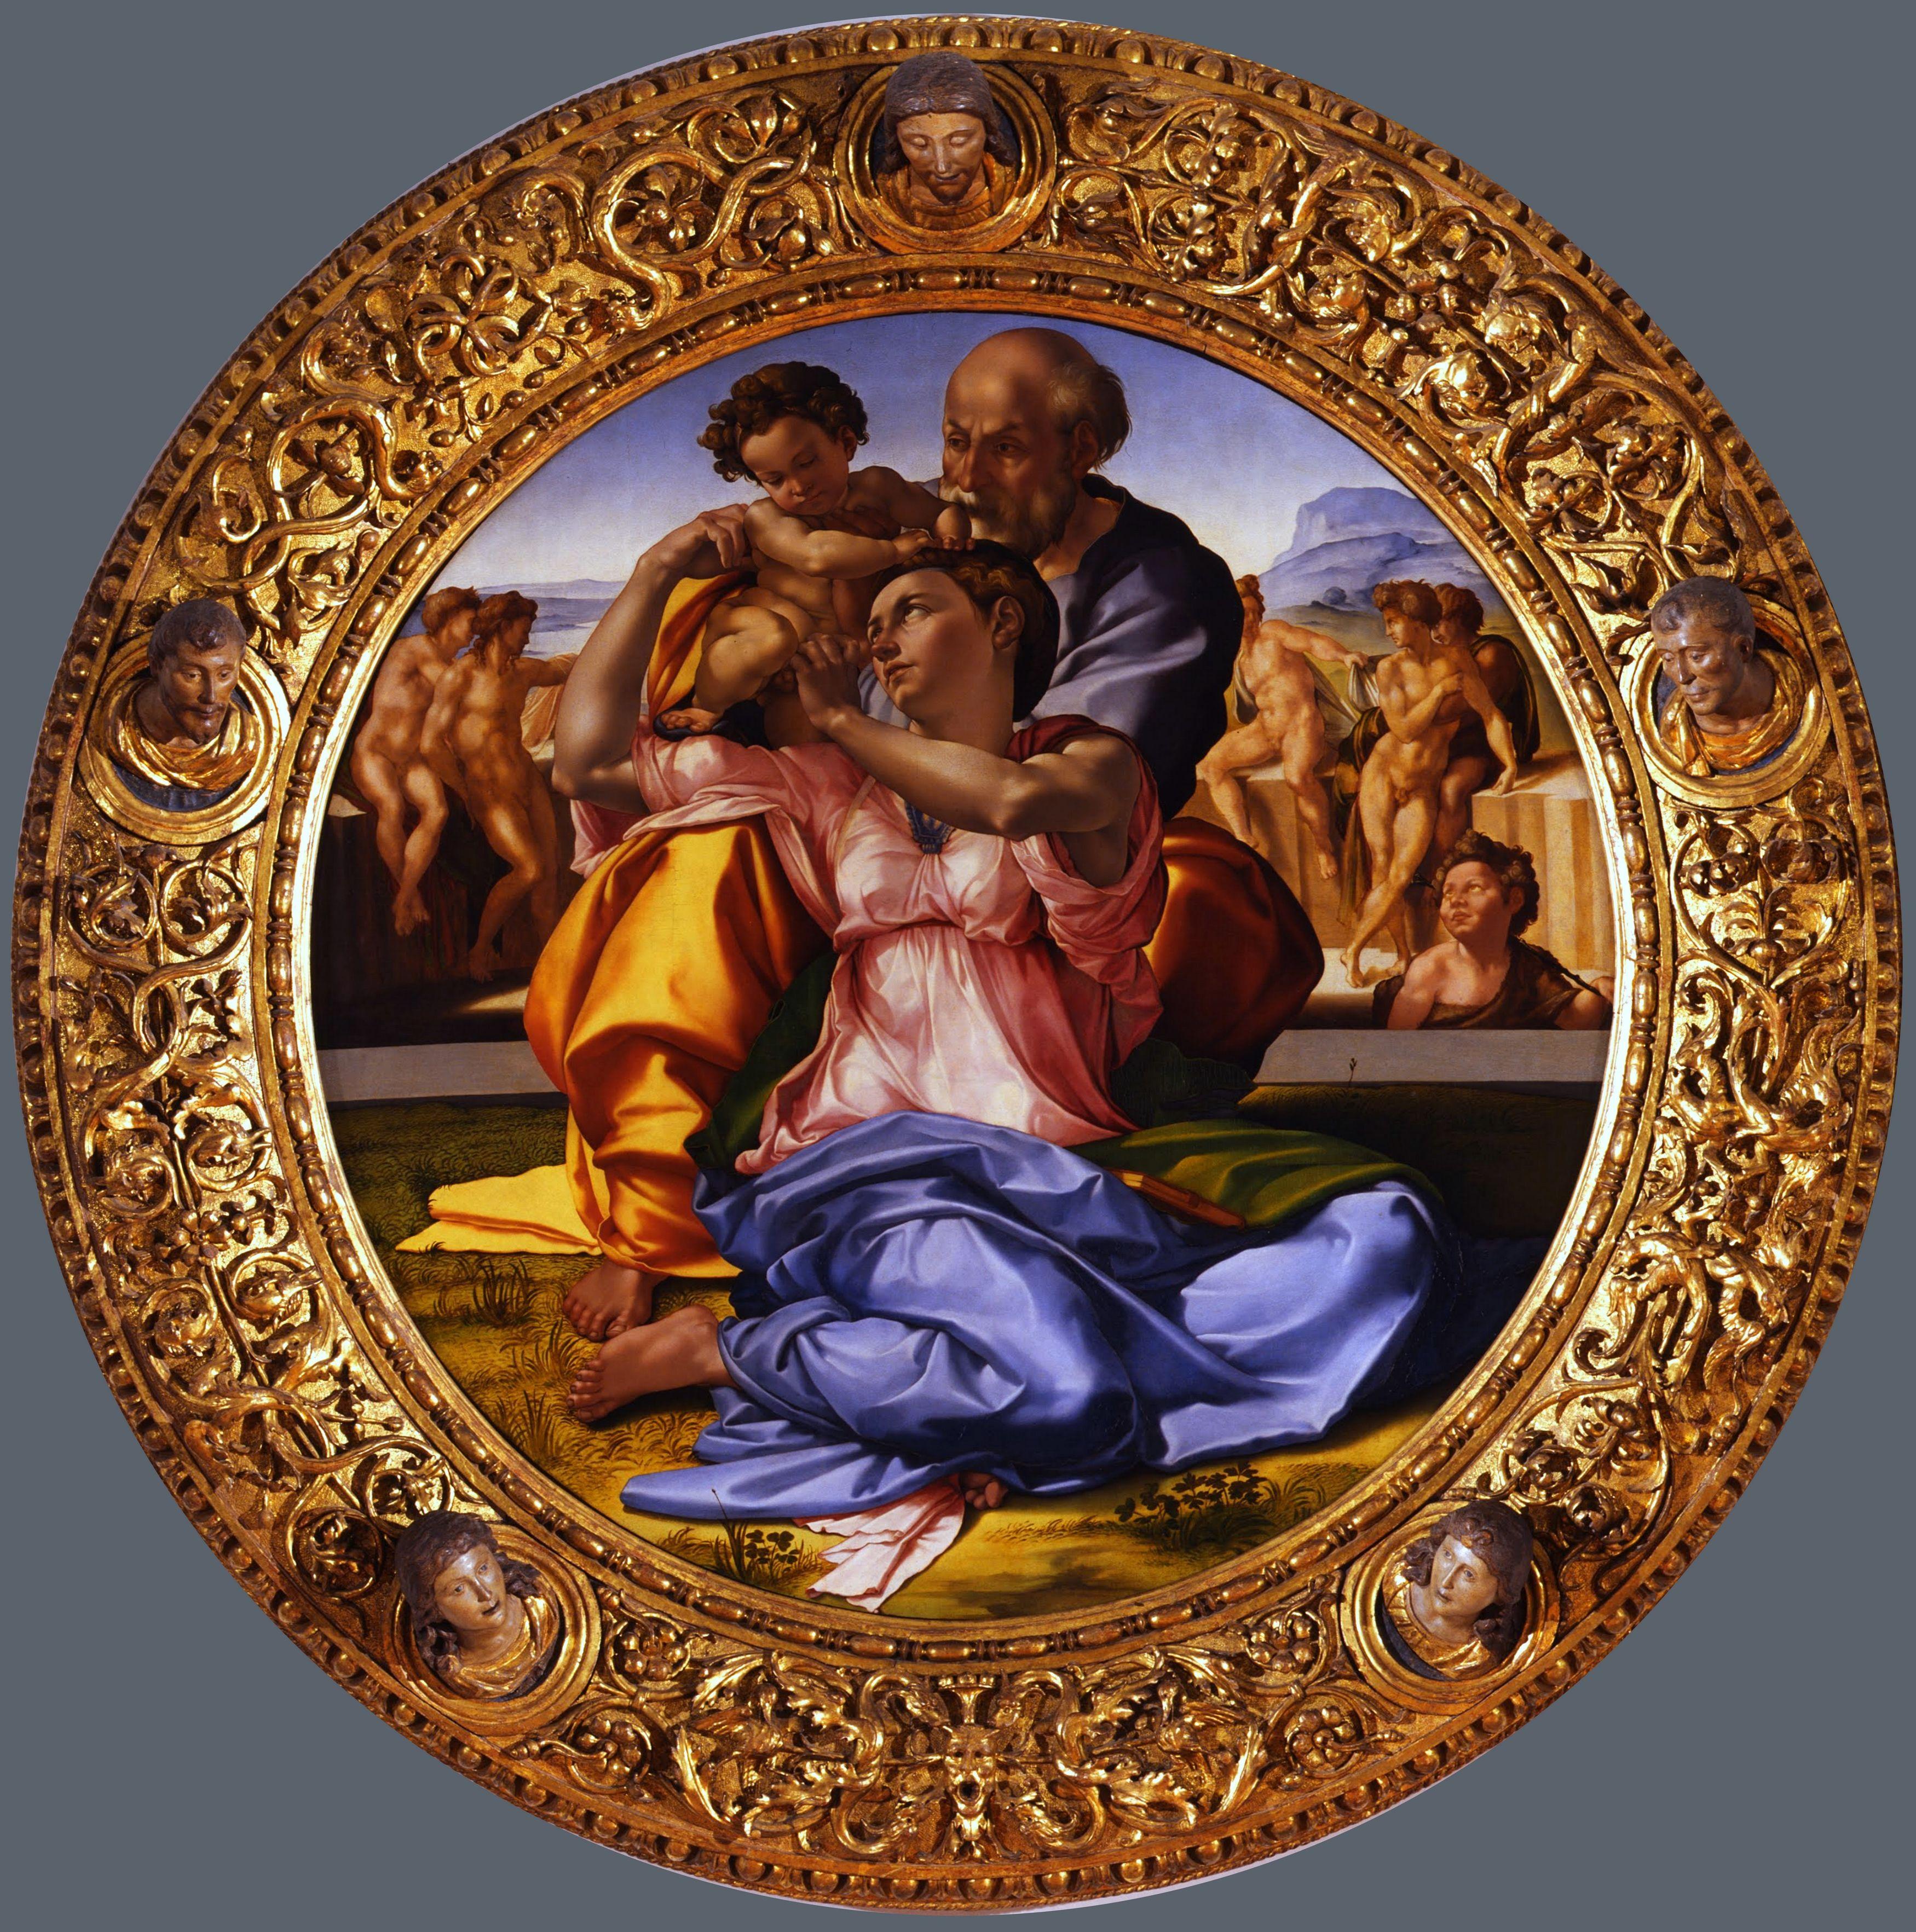 Sagrada Familia Tondo Doni Miguel ángel Hacia 1503 Miguel Angel Buonarroti Miguel Angel Buonarotti Capilla Sixtina